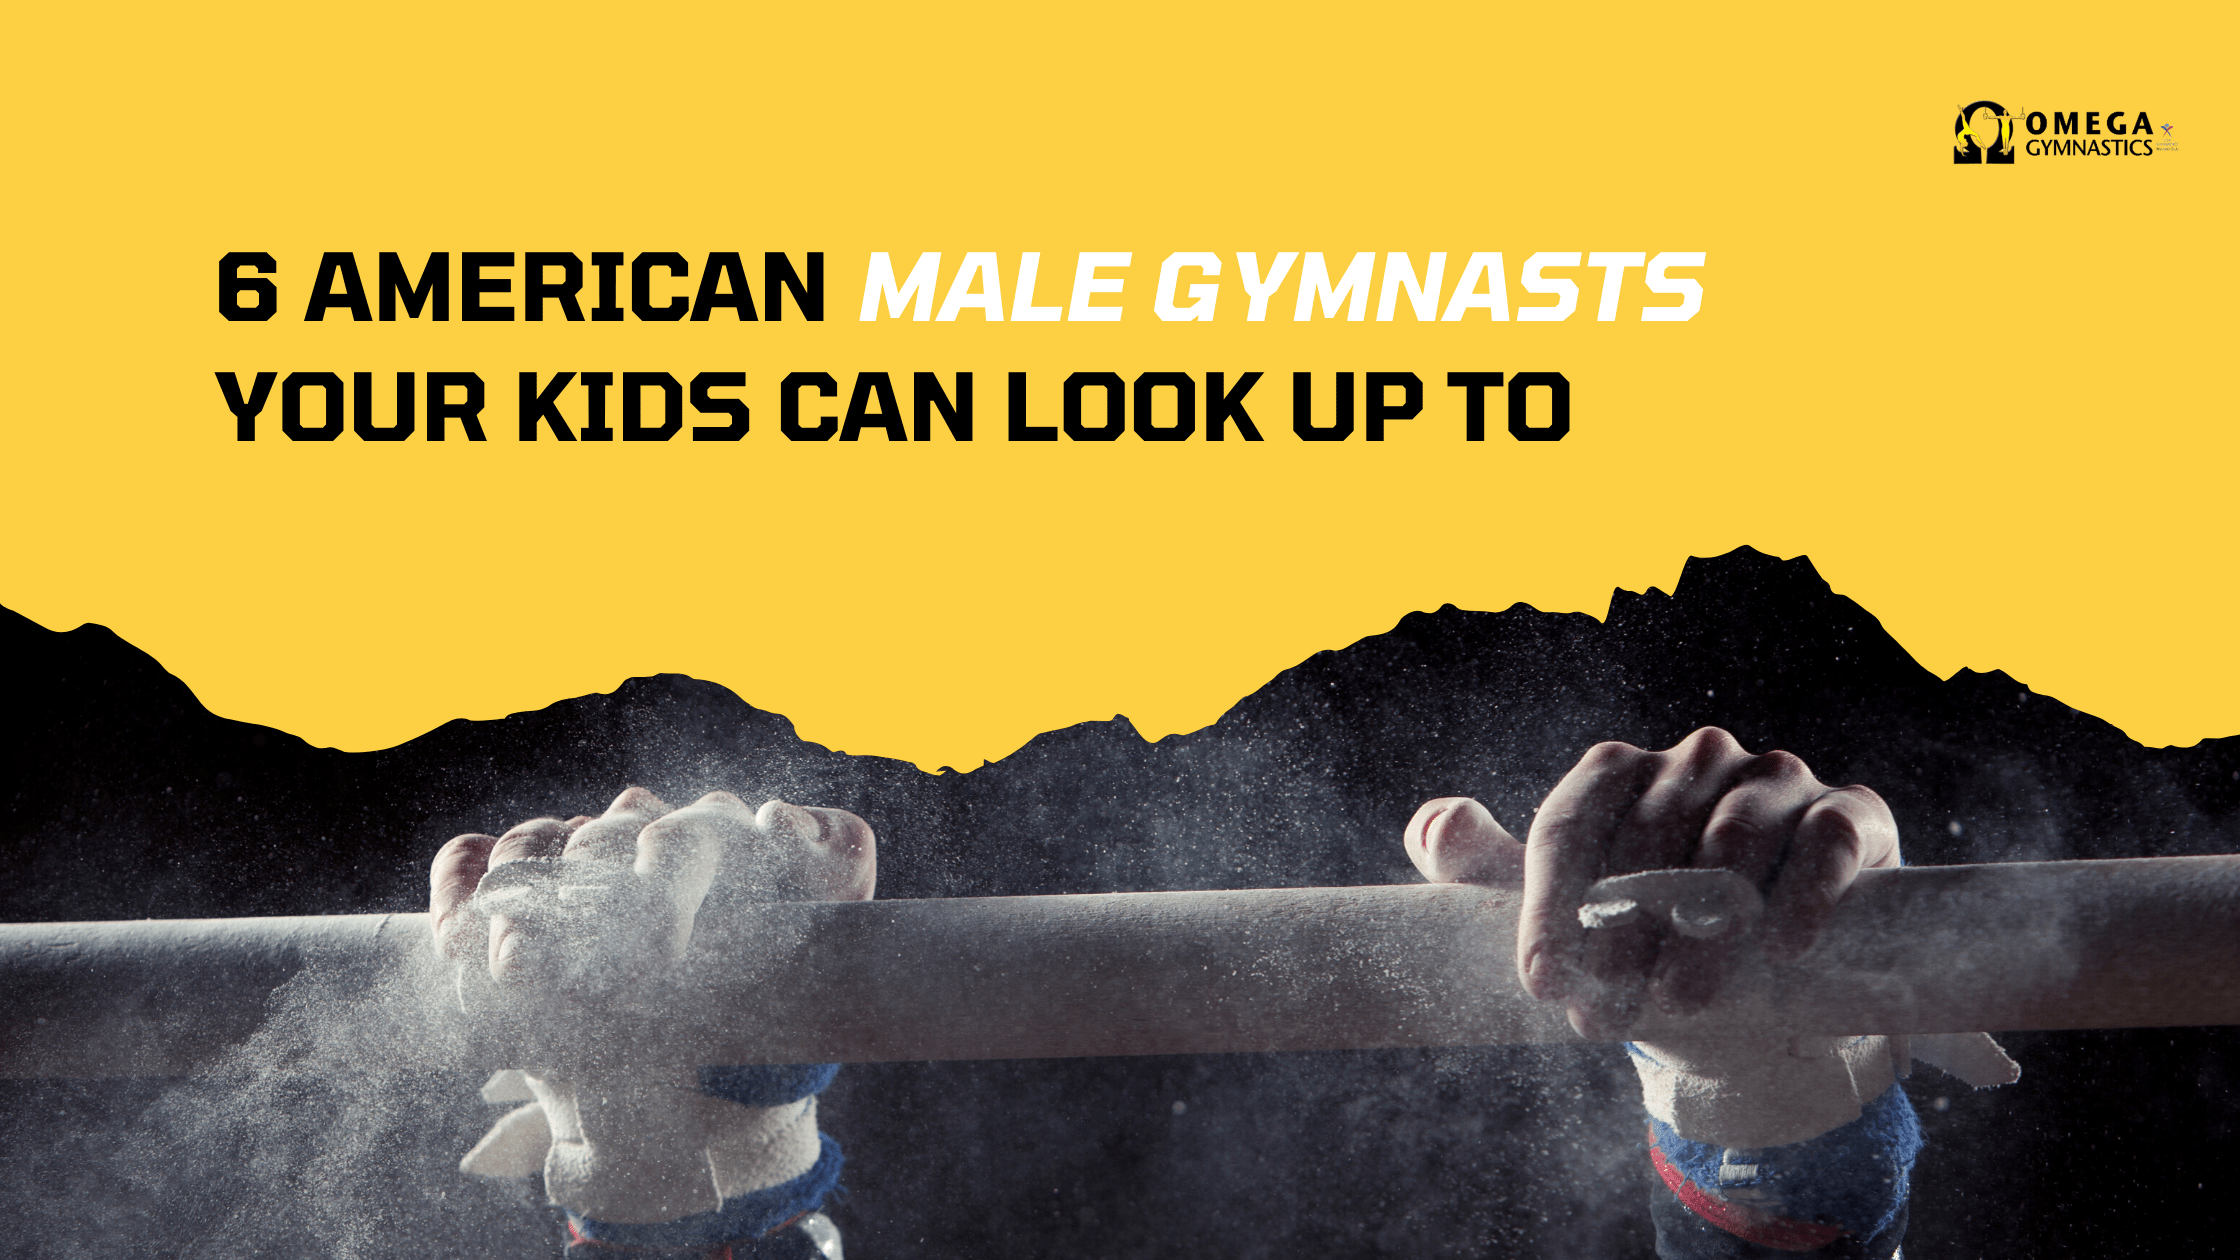 american male gymnasts